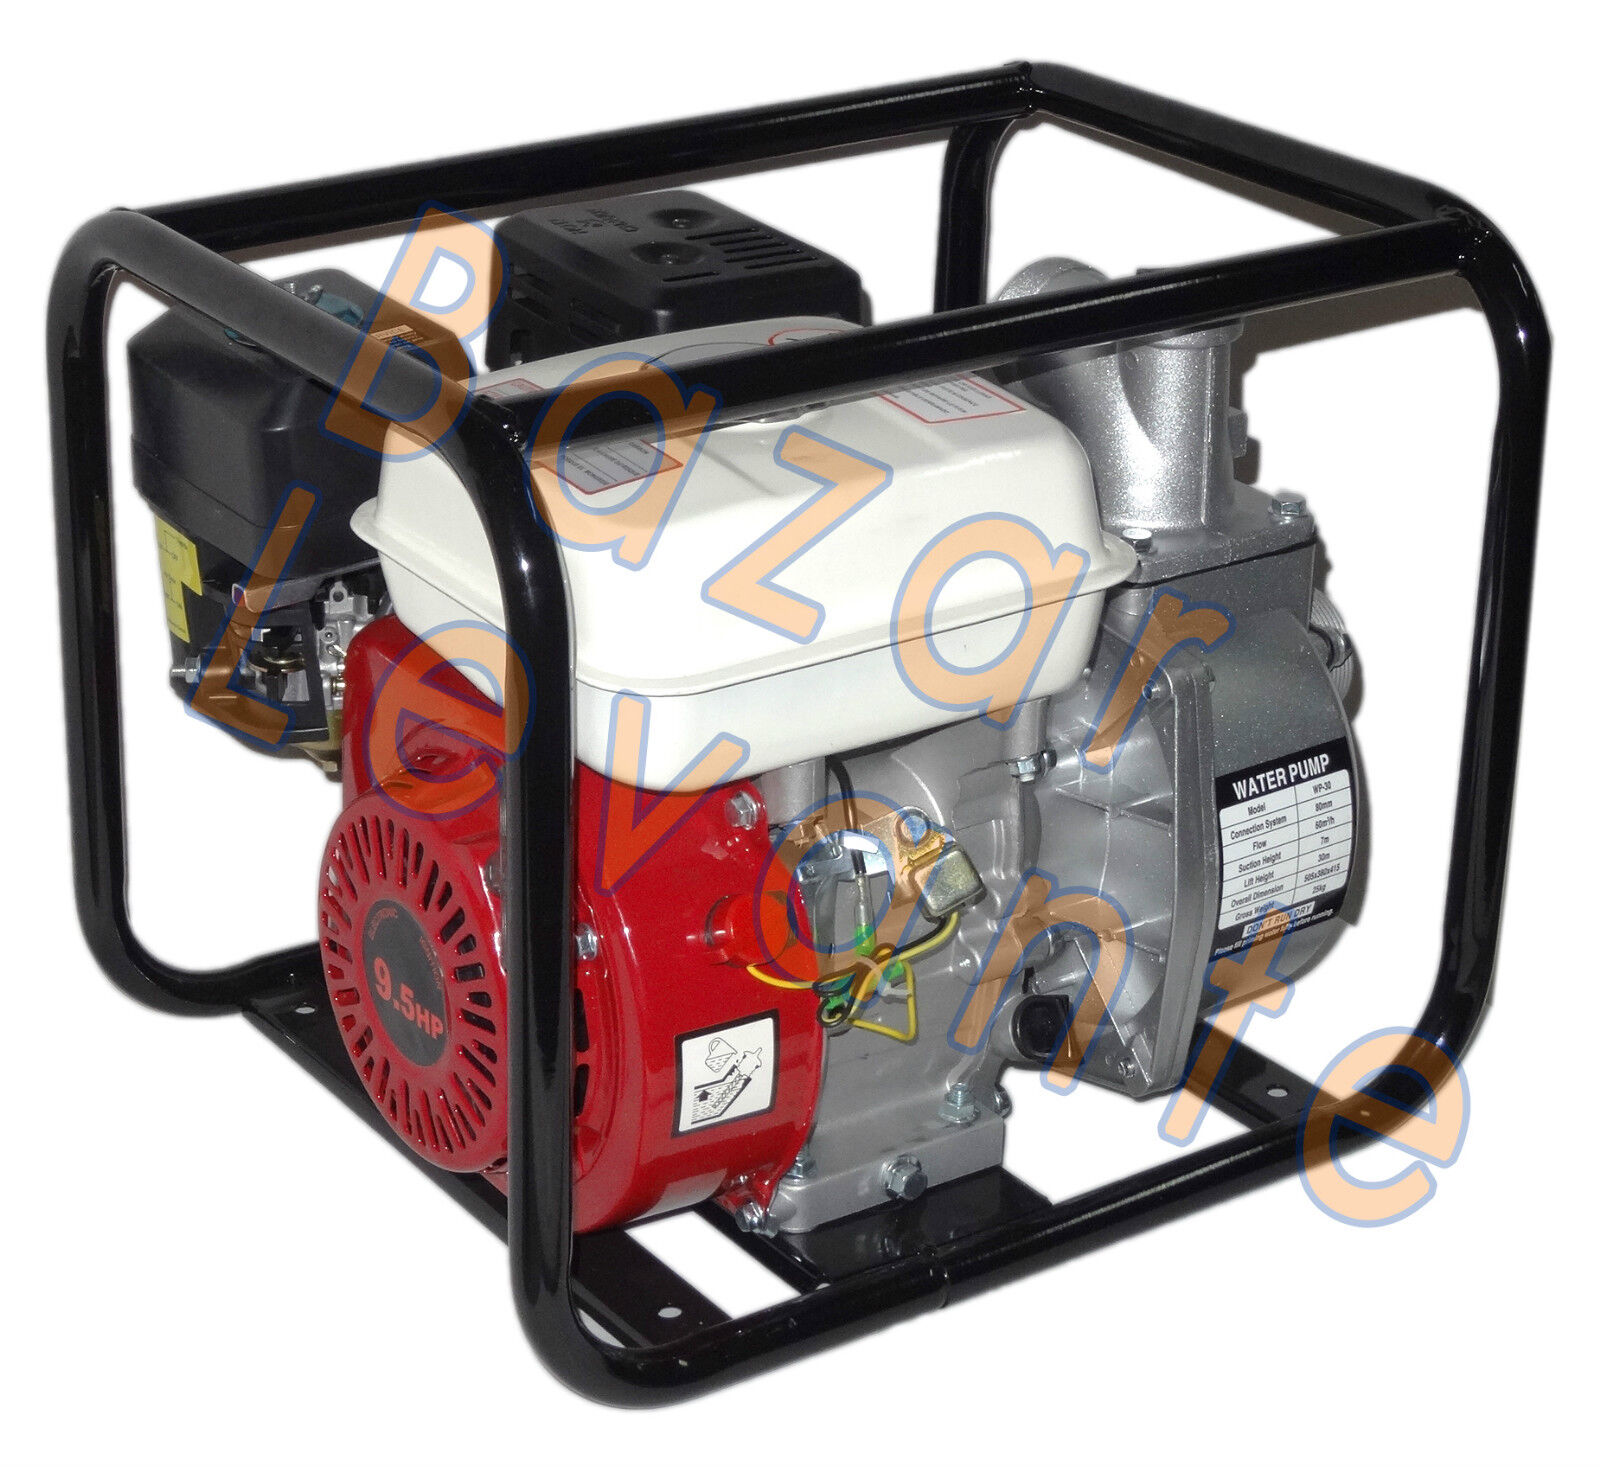 Pumpe- Wasser zu Benzin 30 m3 h 50 mm Motor Motor Motor 4T 5,5 PS-Pumpe   Angenehmes Gefühl    Exquisite Handwerkskunst  2664c5